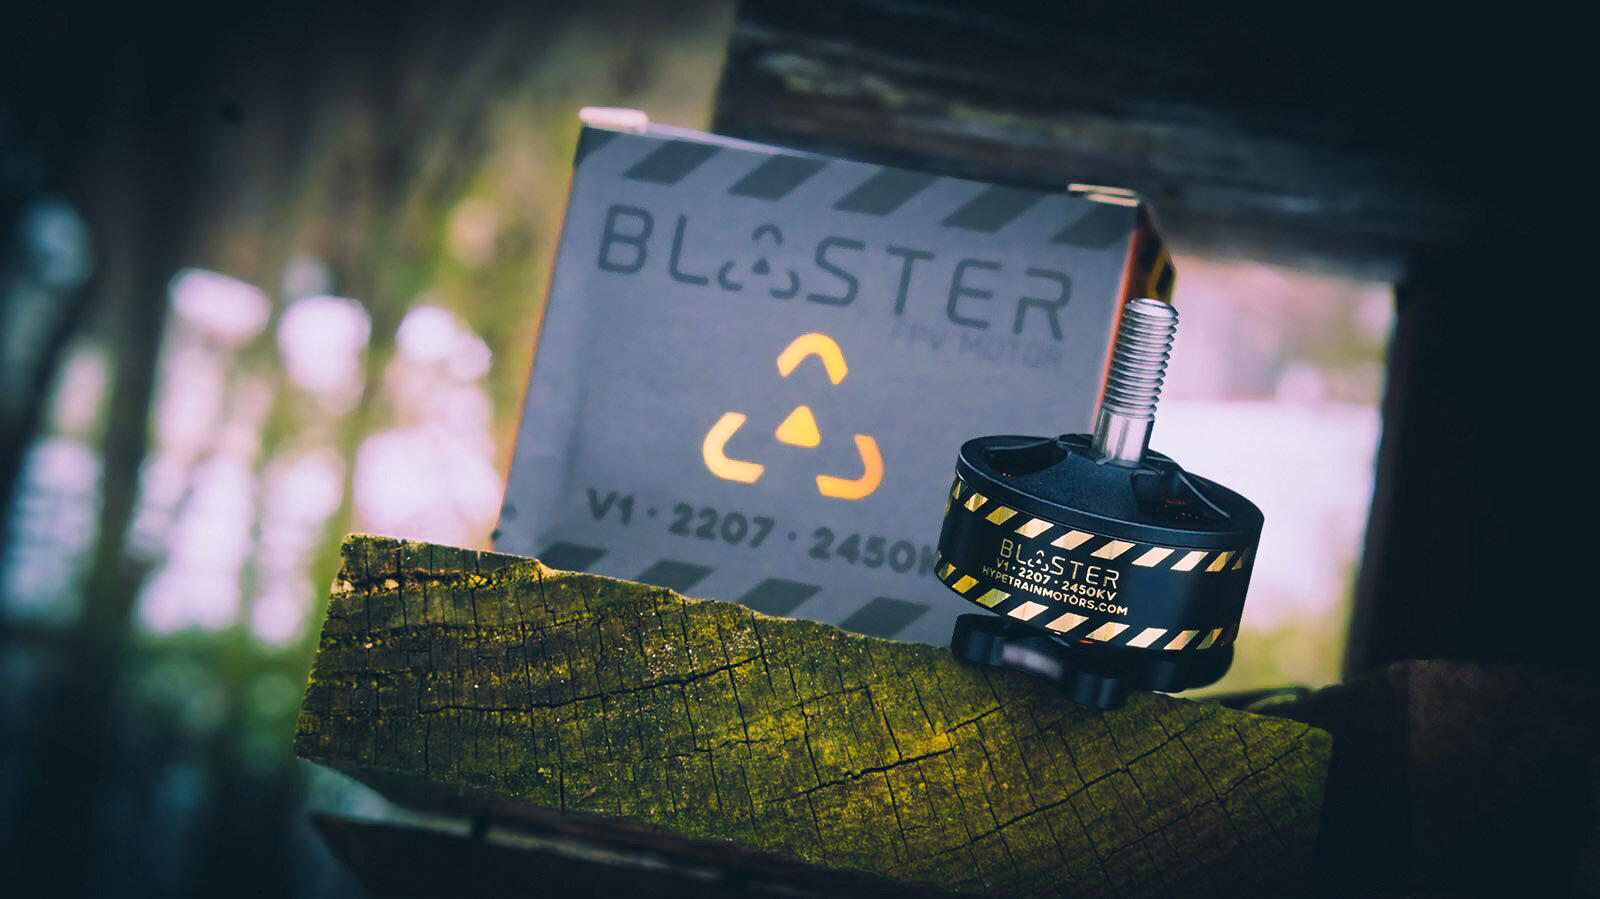 Hypetrain-Blaster-2207-2450KV-images-creative-photo-1.jpg